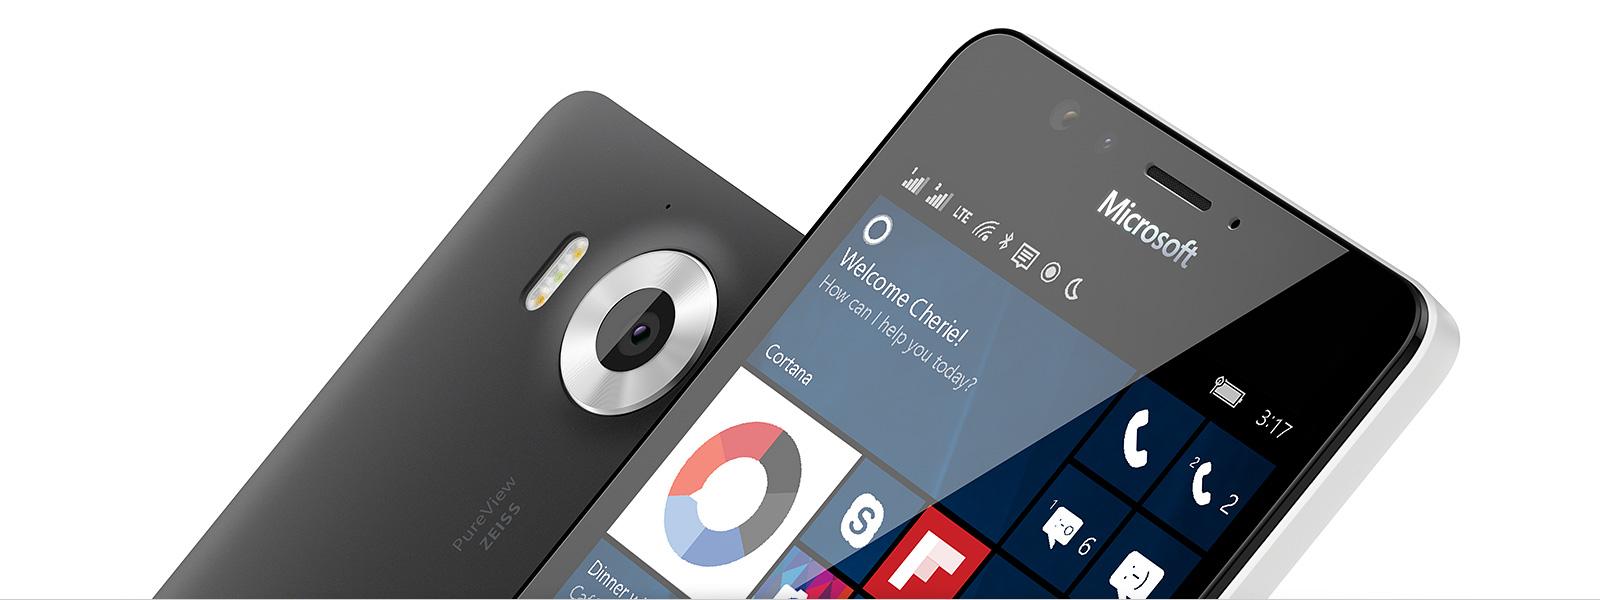 Windows 10 Mobile-Smartphones